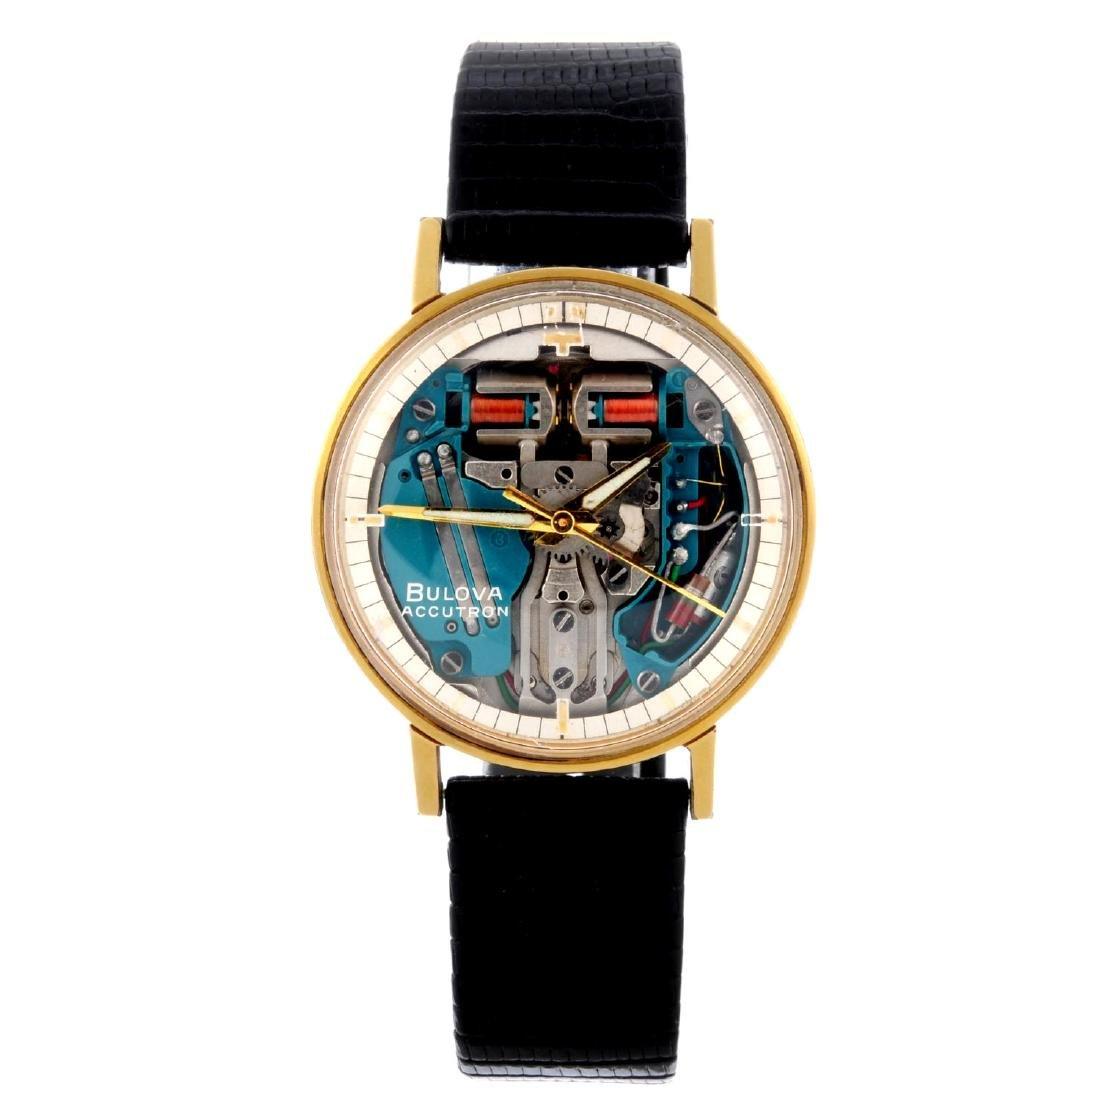 BULOVA - a gentleman's Accutron Spaceview wrist watch.